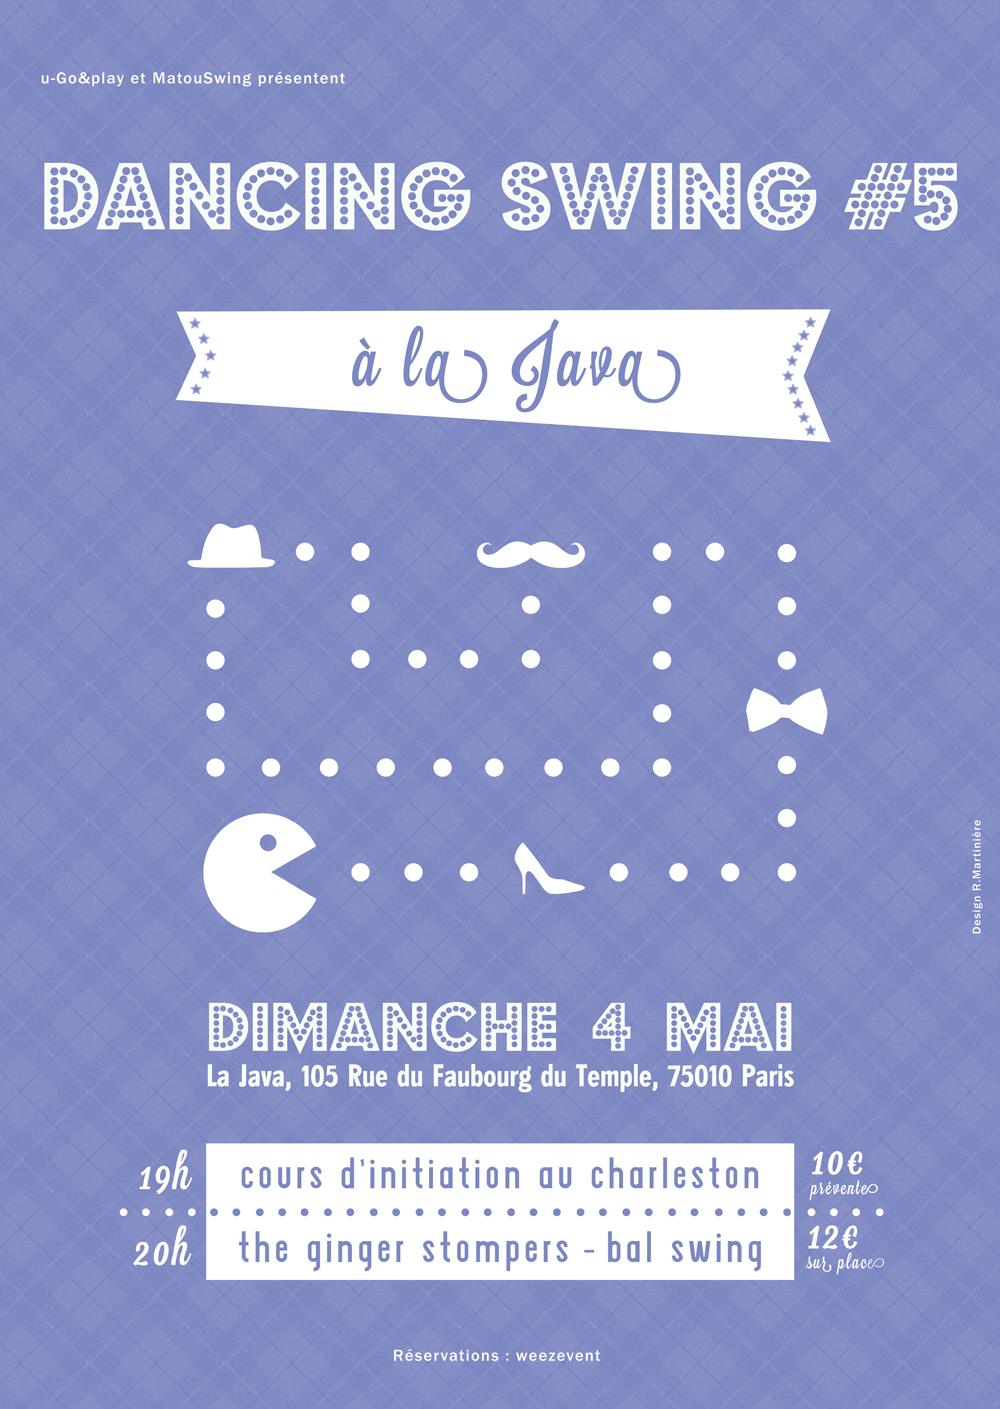 Dancing Swing #5